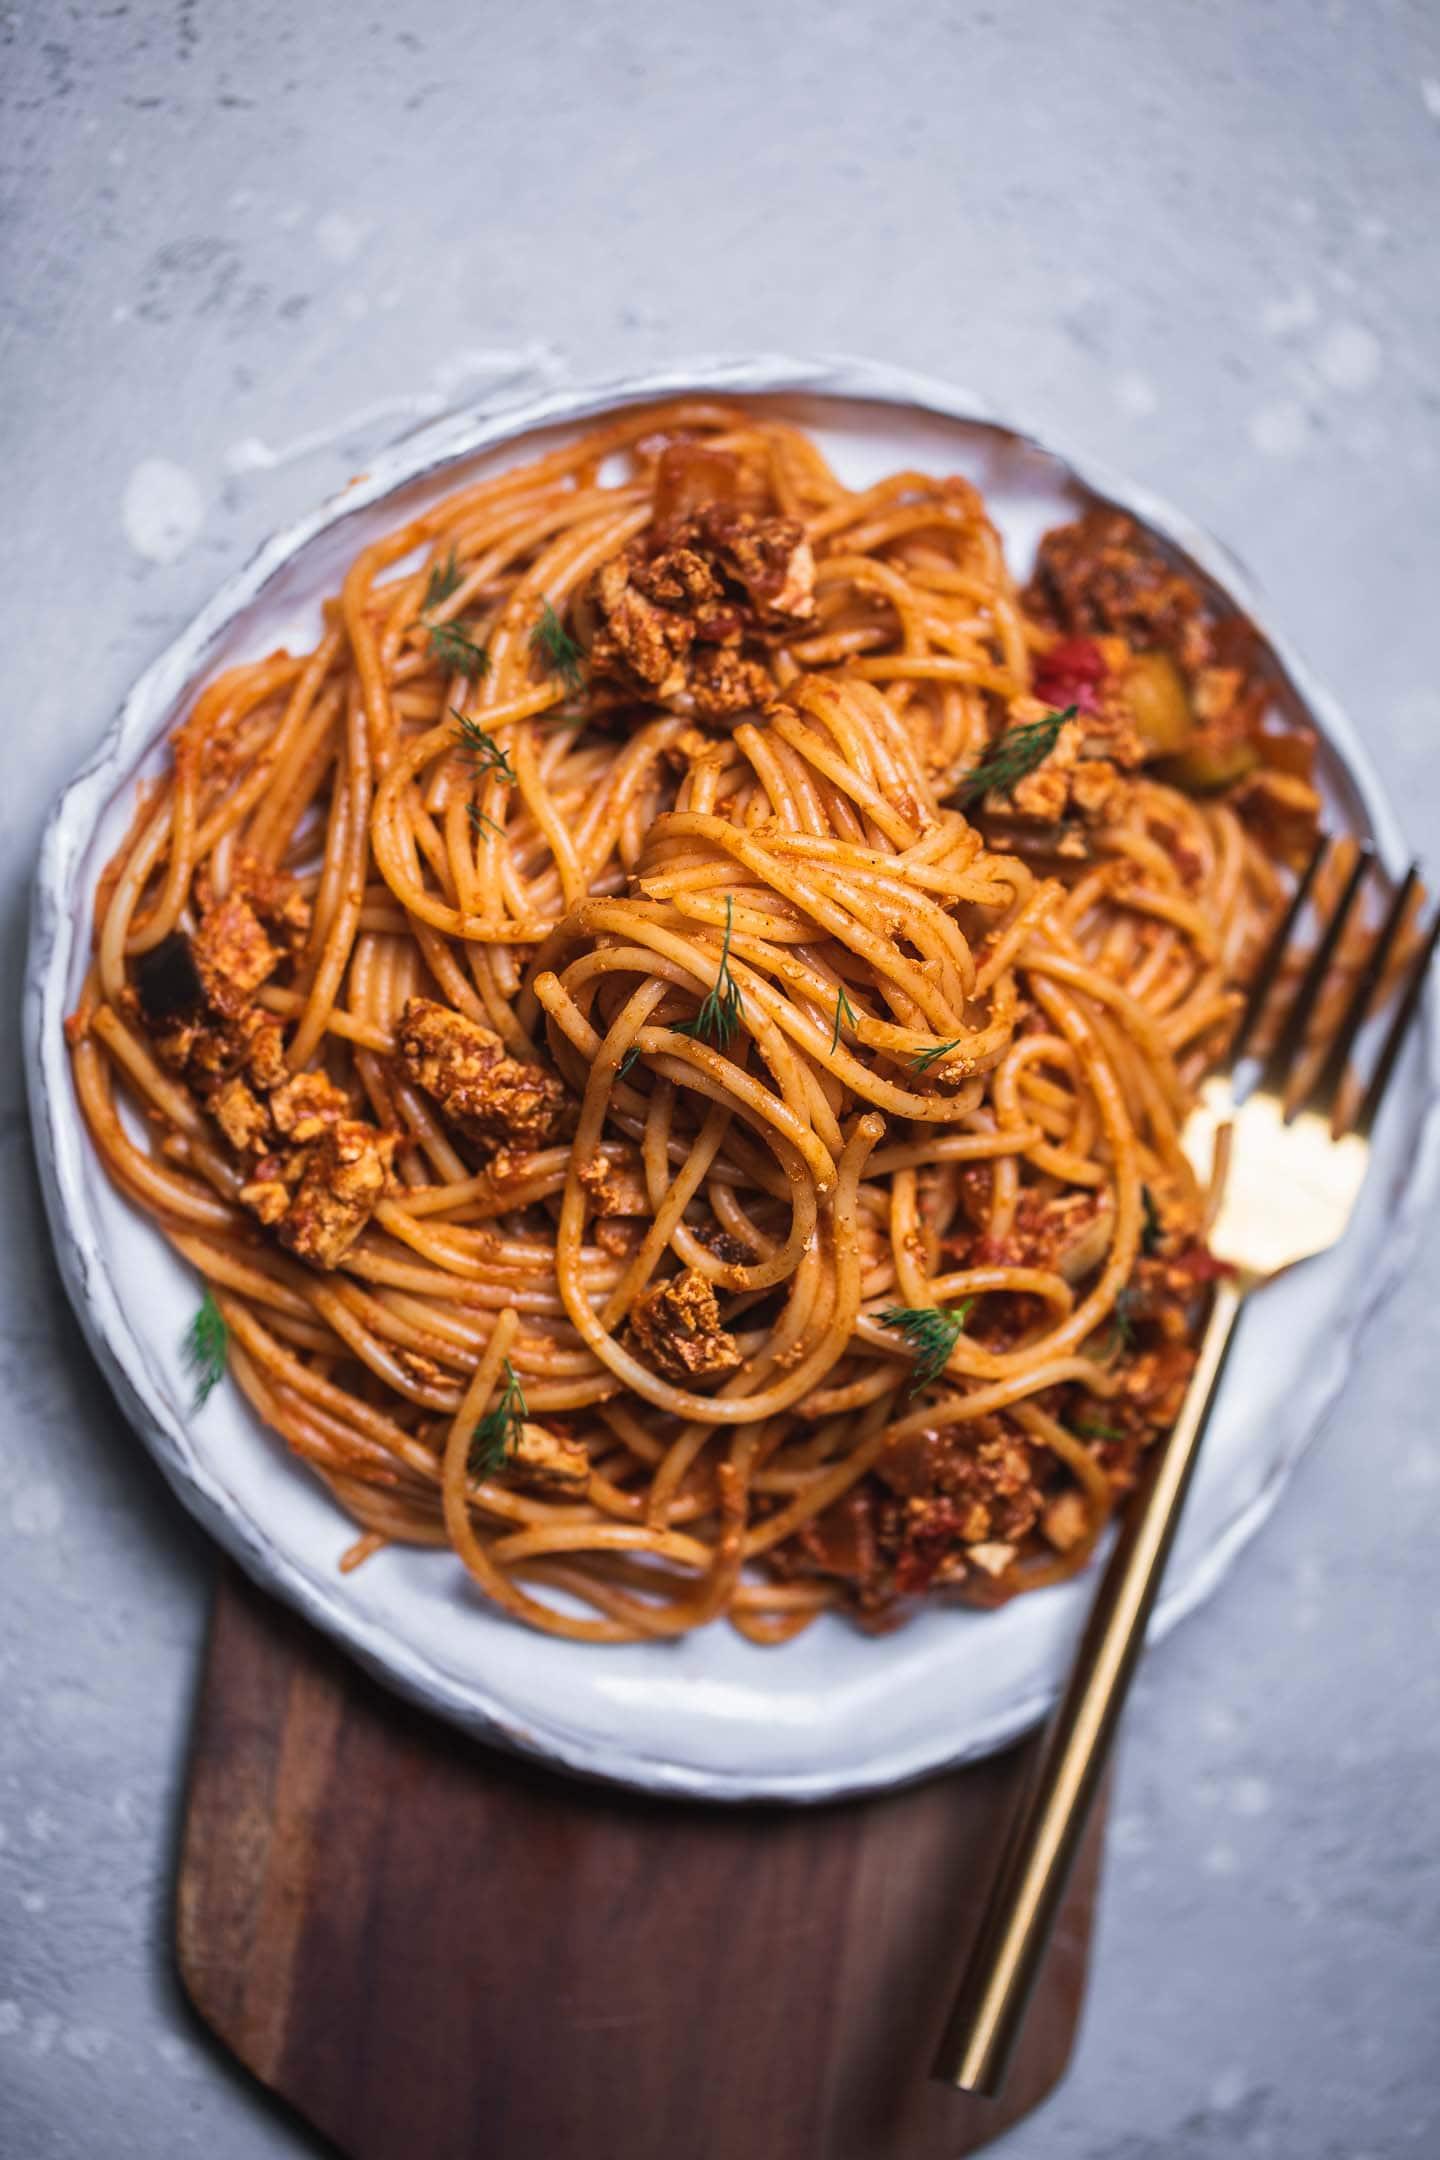 Vegan smoky eggplant pasta gluten-free